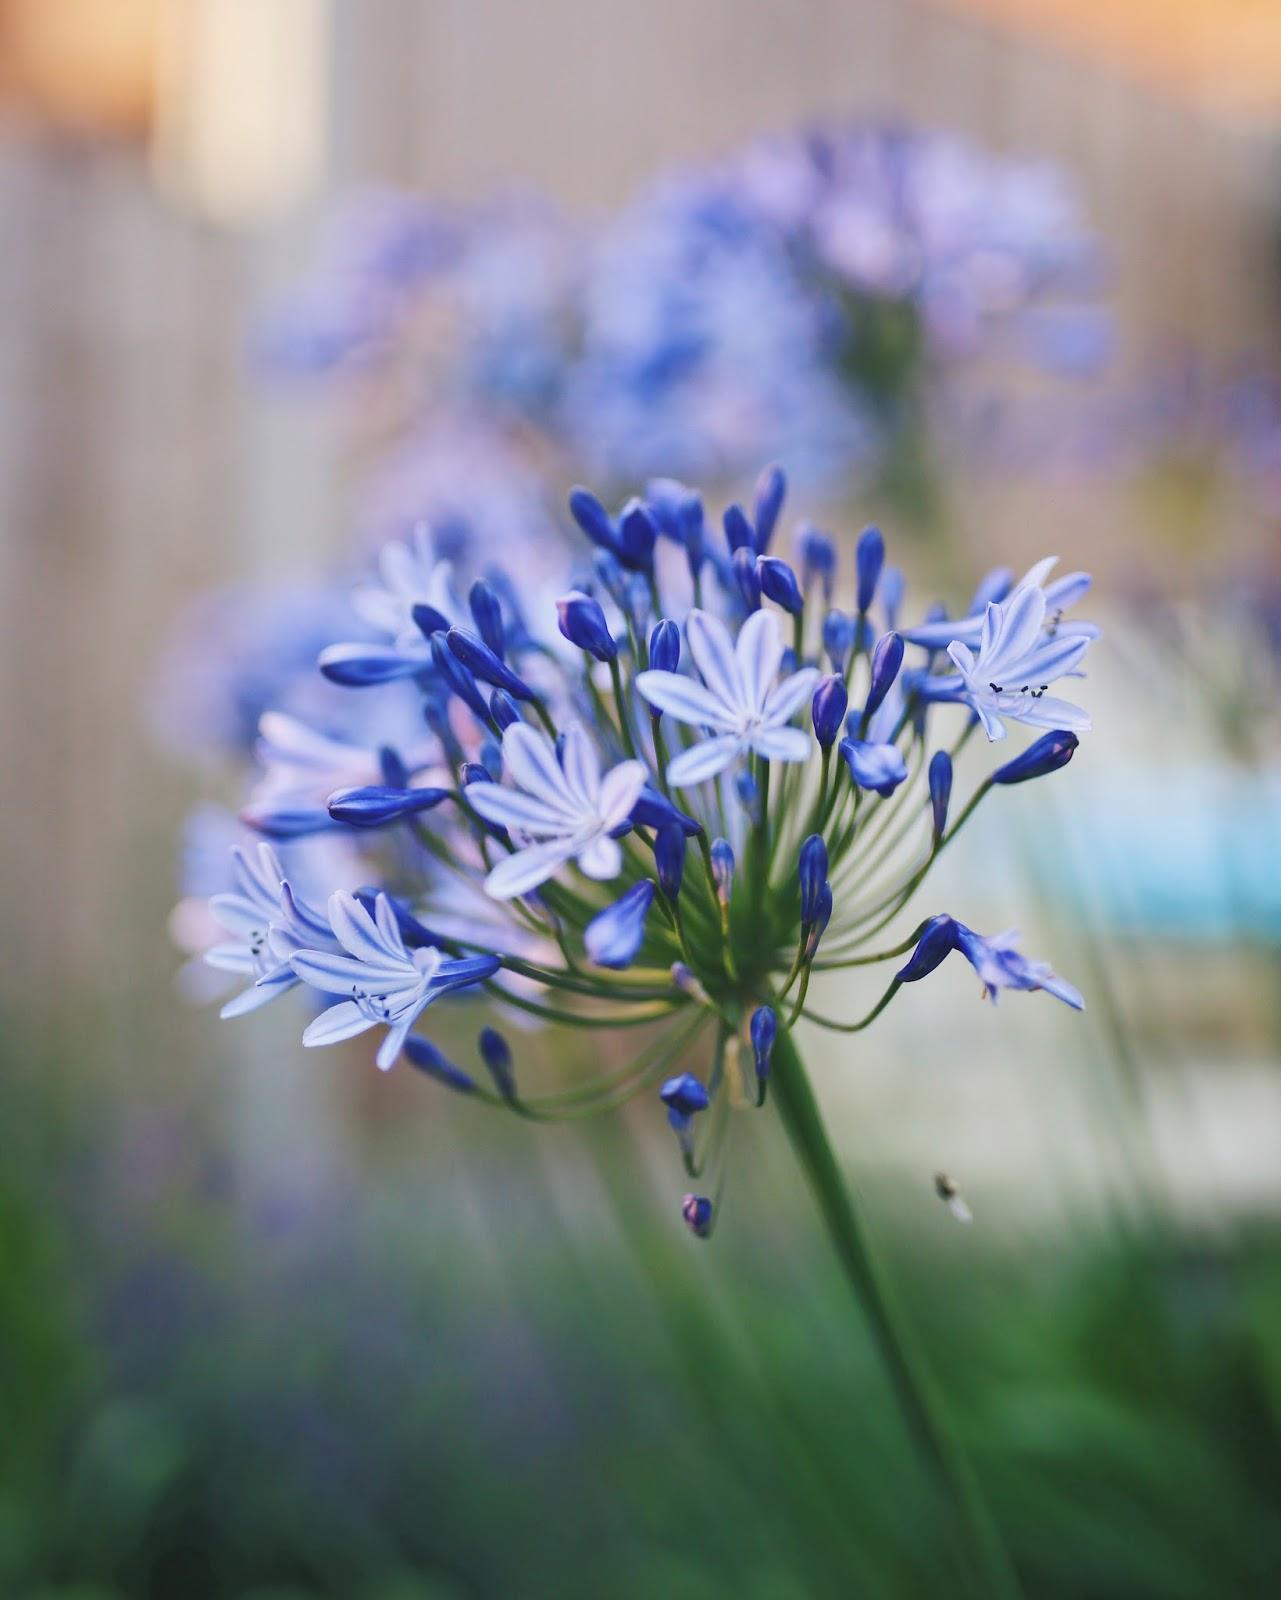 Cornflower, Blue, Purple, Blooms, Plants, Flowers, Katie Writes Blog, Katie Writes,